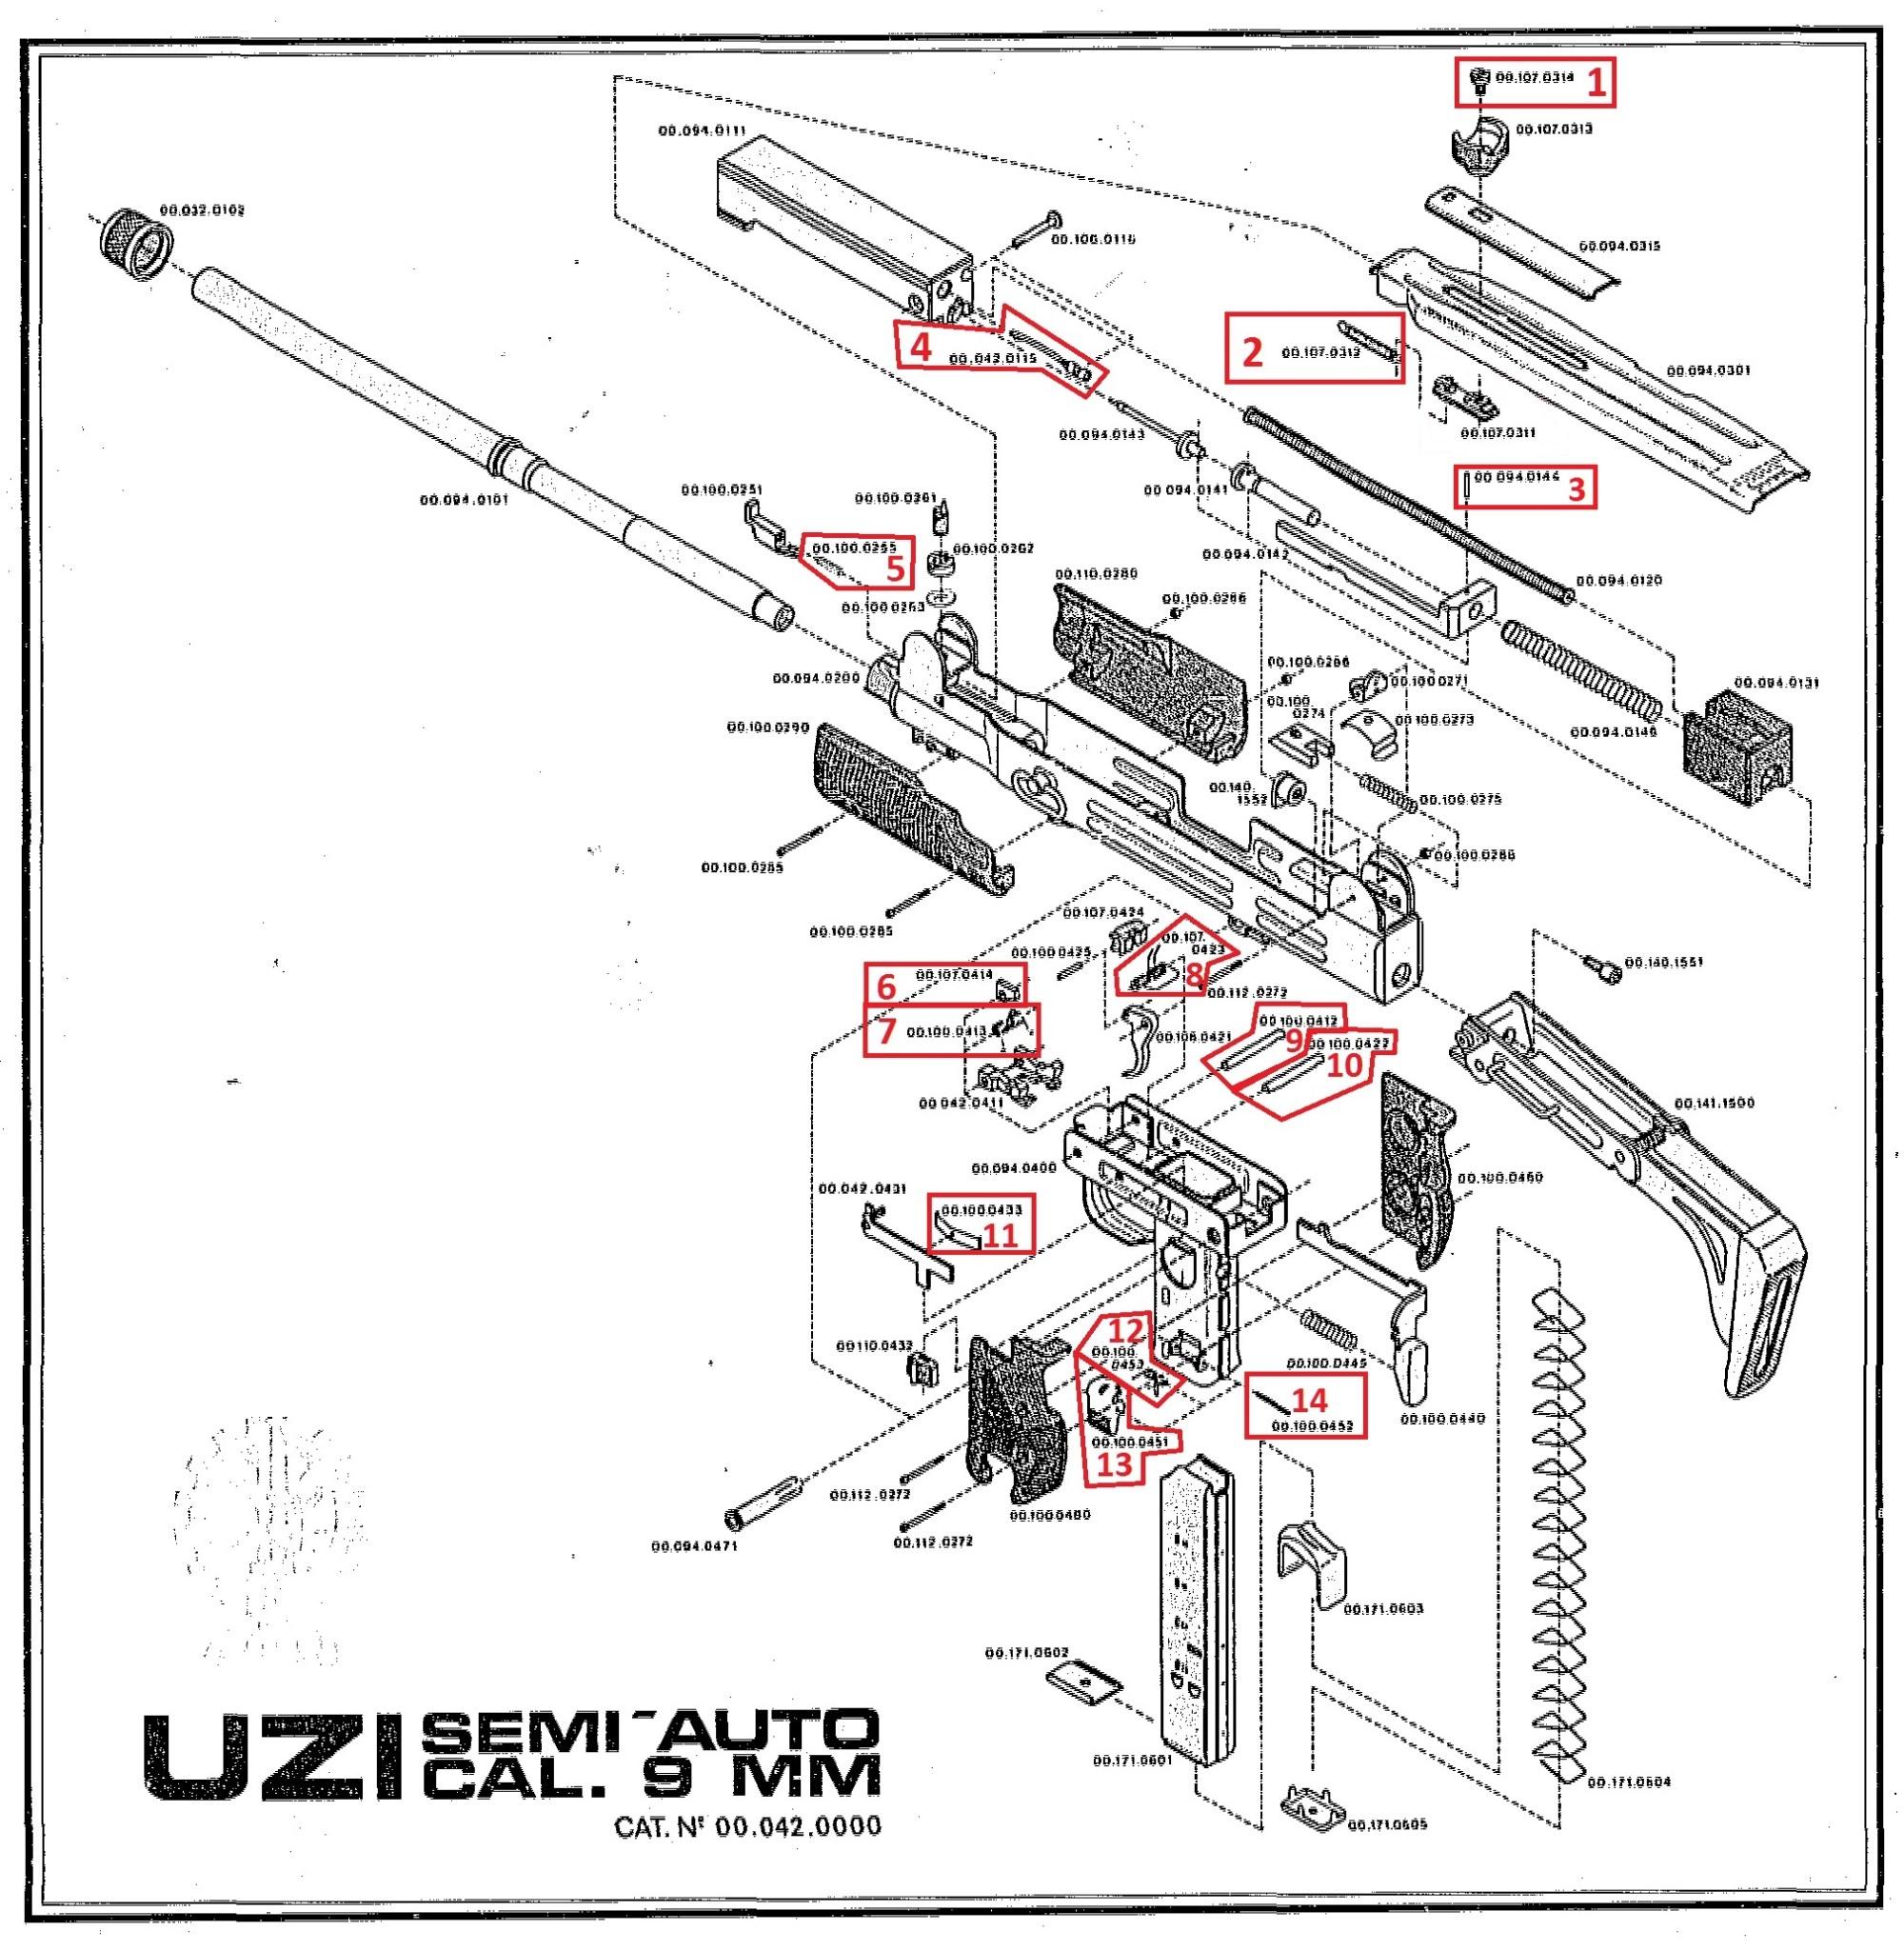 hight resolution of item 19 on the uzi pistol exploded diagram